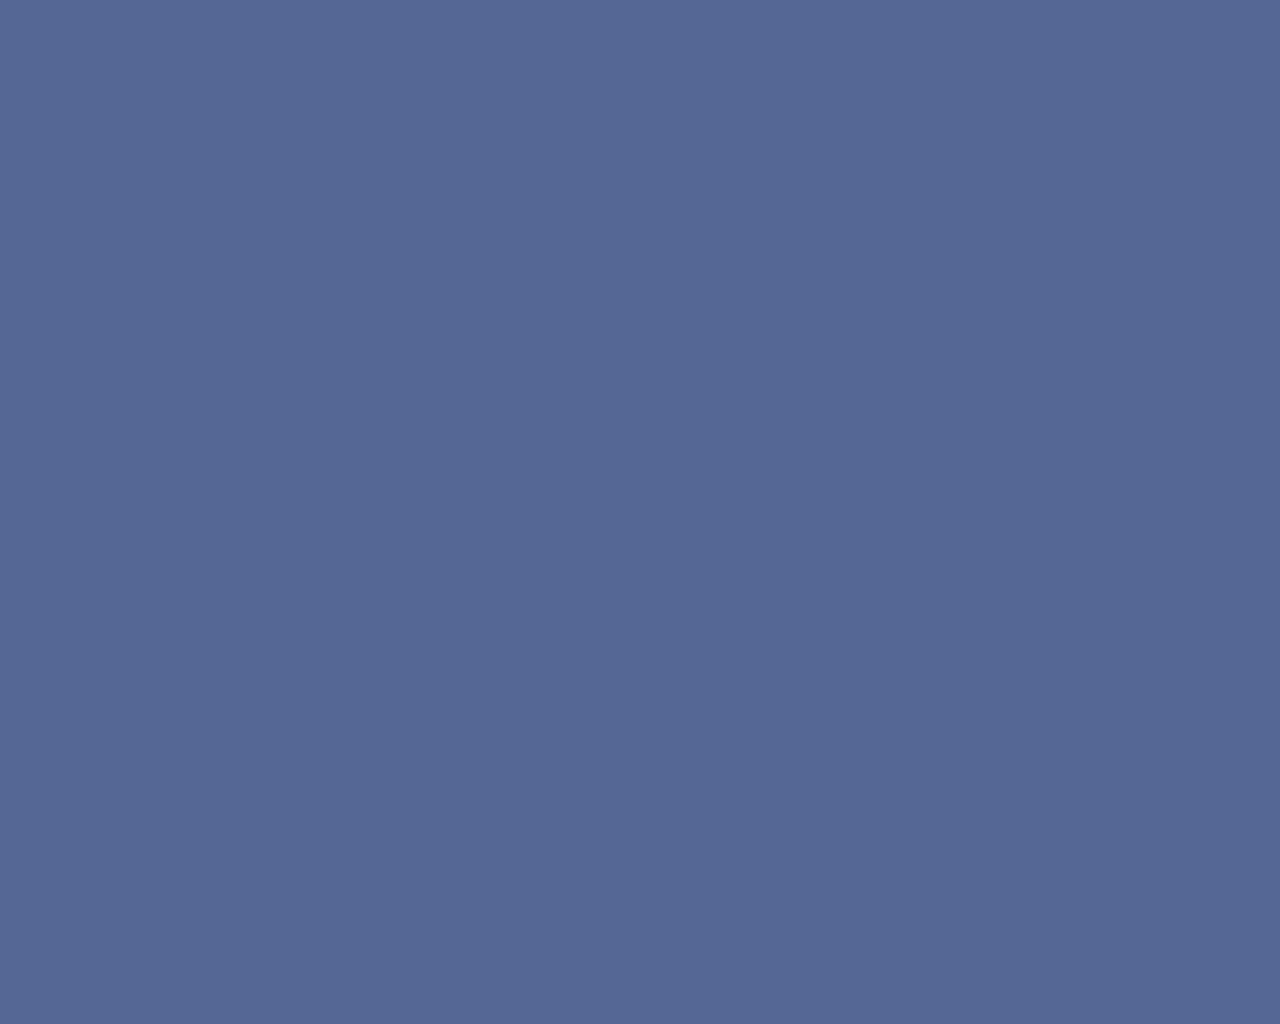 1280x1024 UCLA Blue Solid Color Background